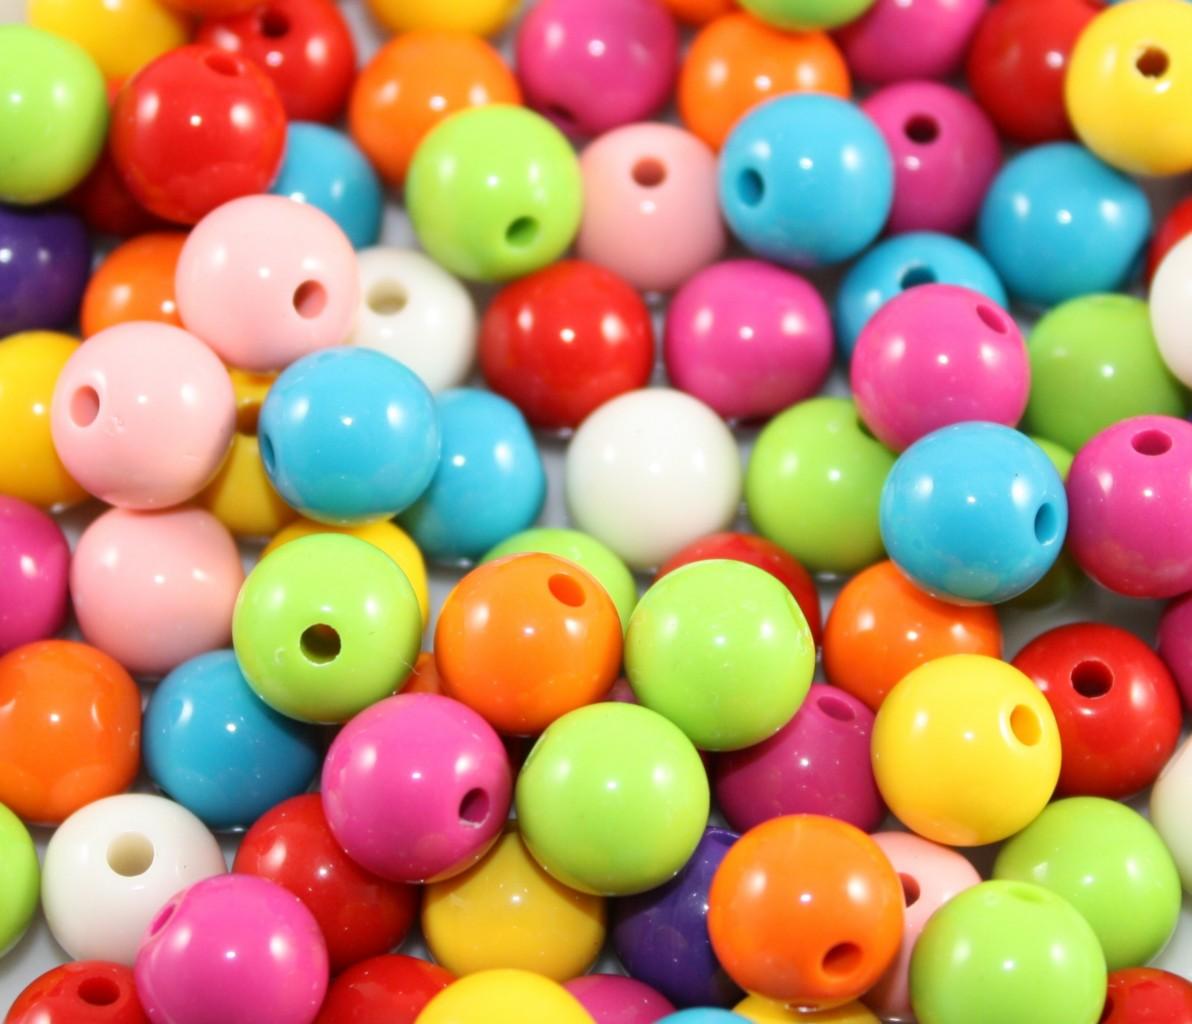 300x6mm-200x8mm-100x10mm-50x12mm-Acrylic-Round-Beads-Mixed